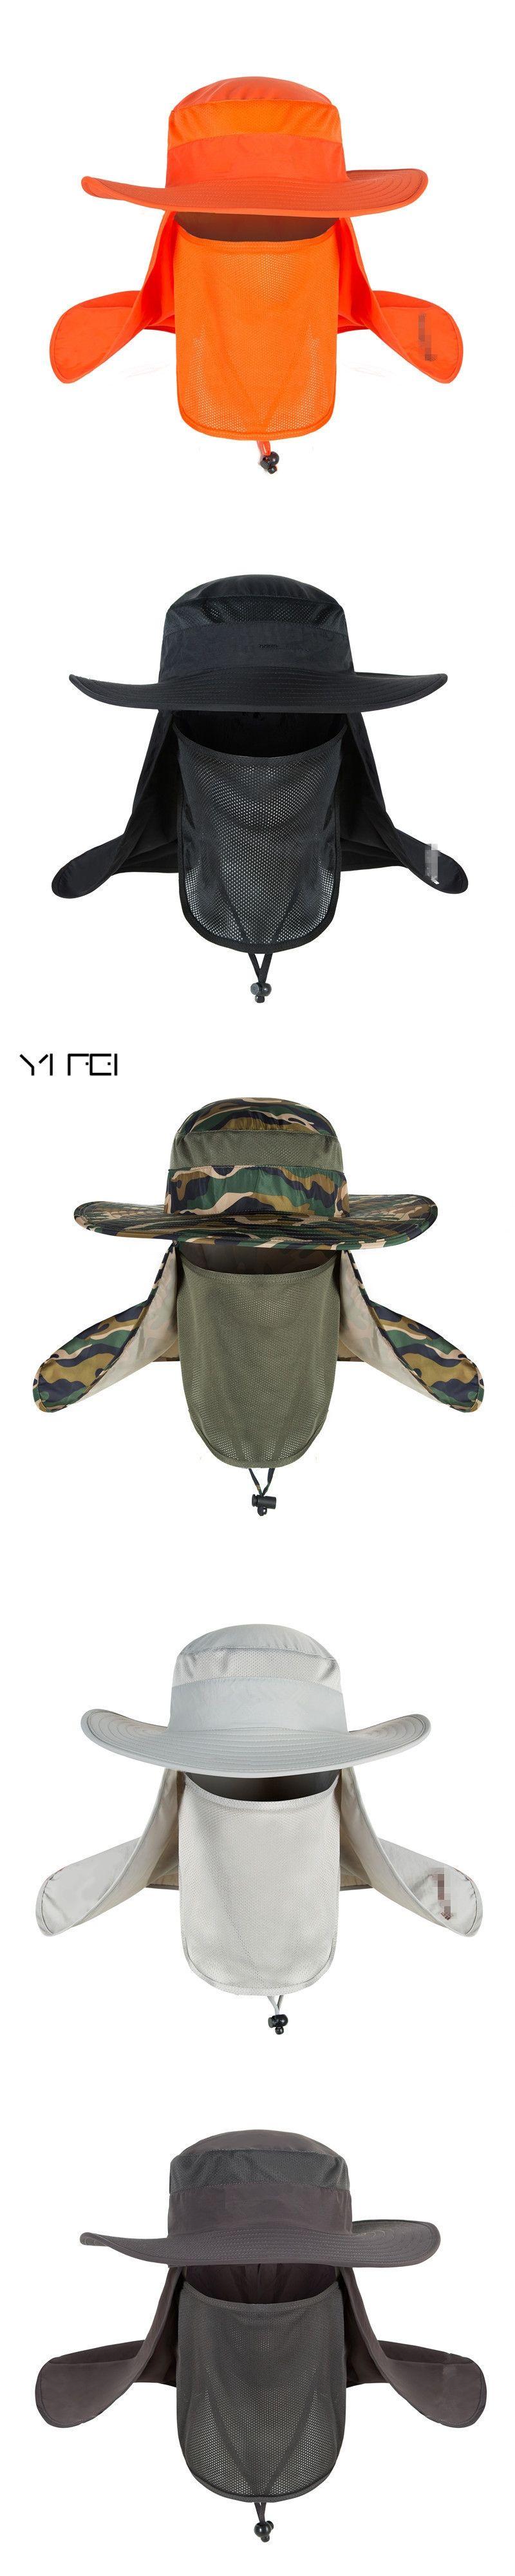 ccfc1a47edc YIFEI New Summer wind-proof Sun Hats SPF 30+ UV Protection Fishing Hat  Fisherman